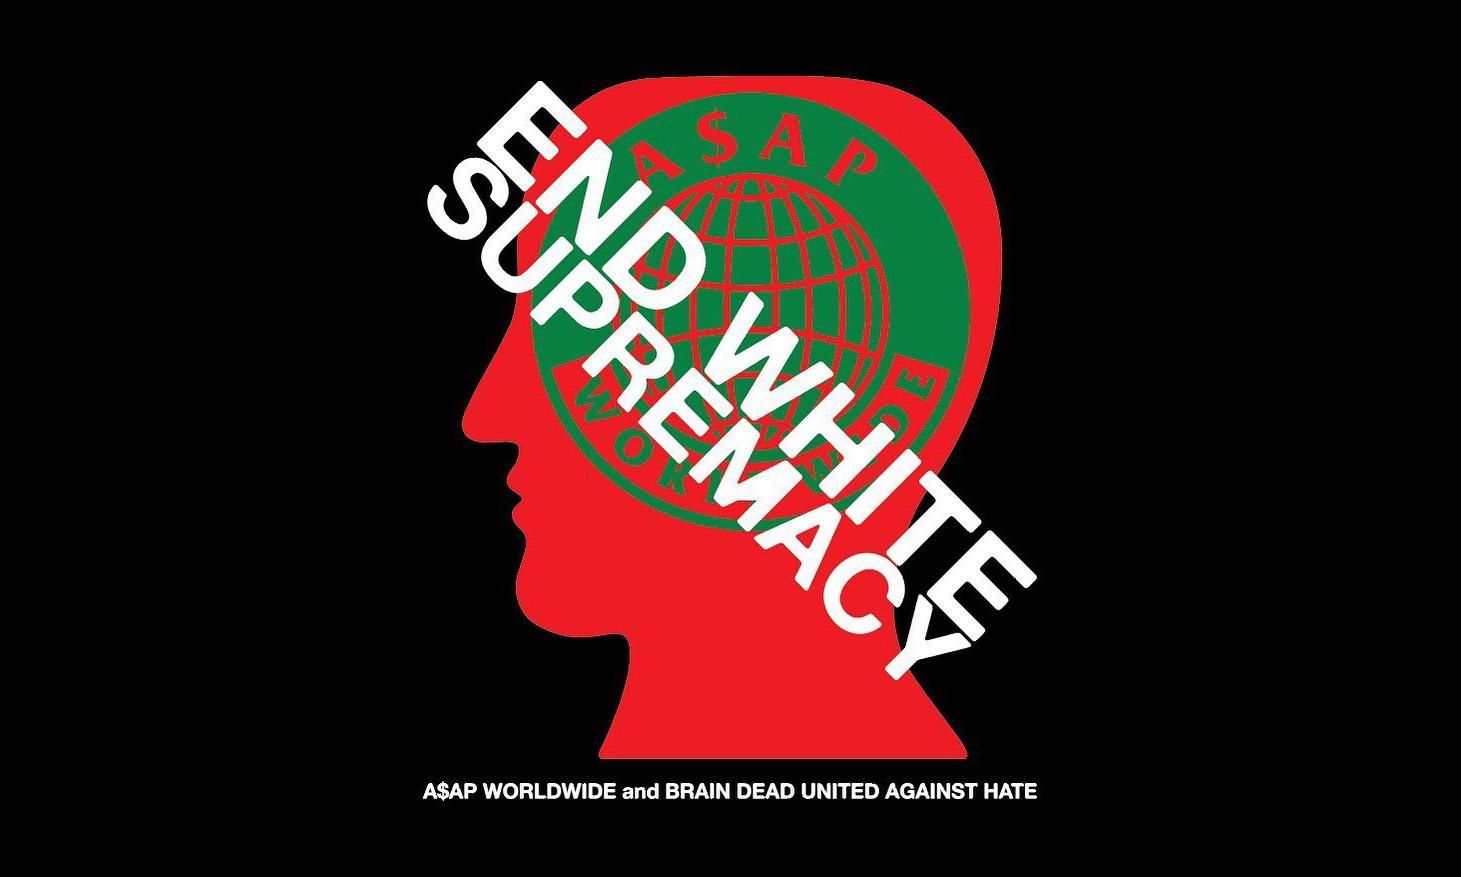 Brain Dead 将联手 A$AP Mob 为种族歧视事件发声